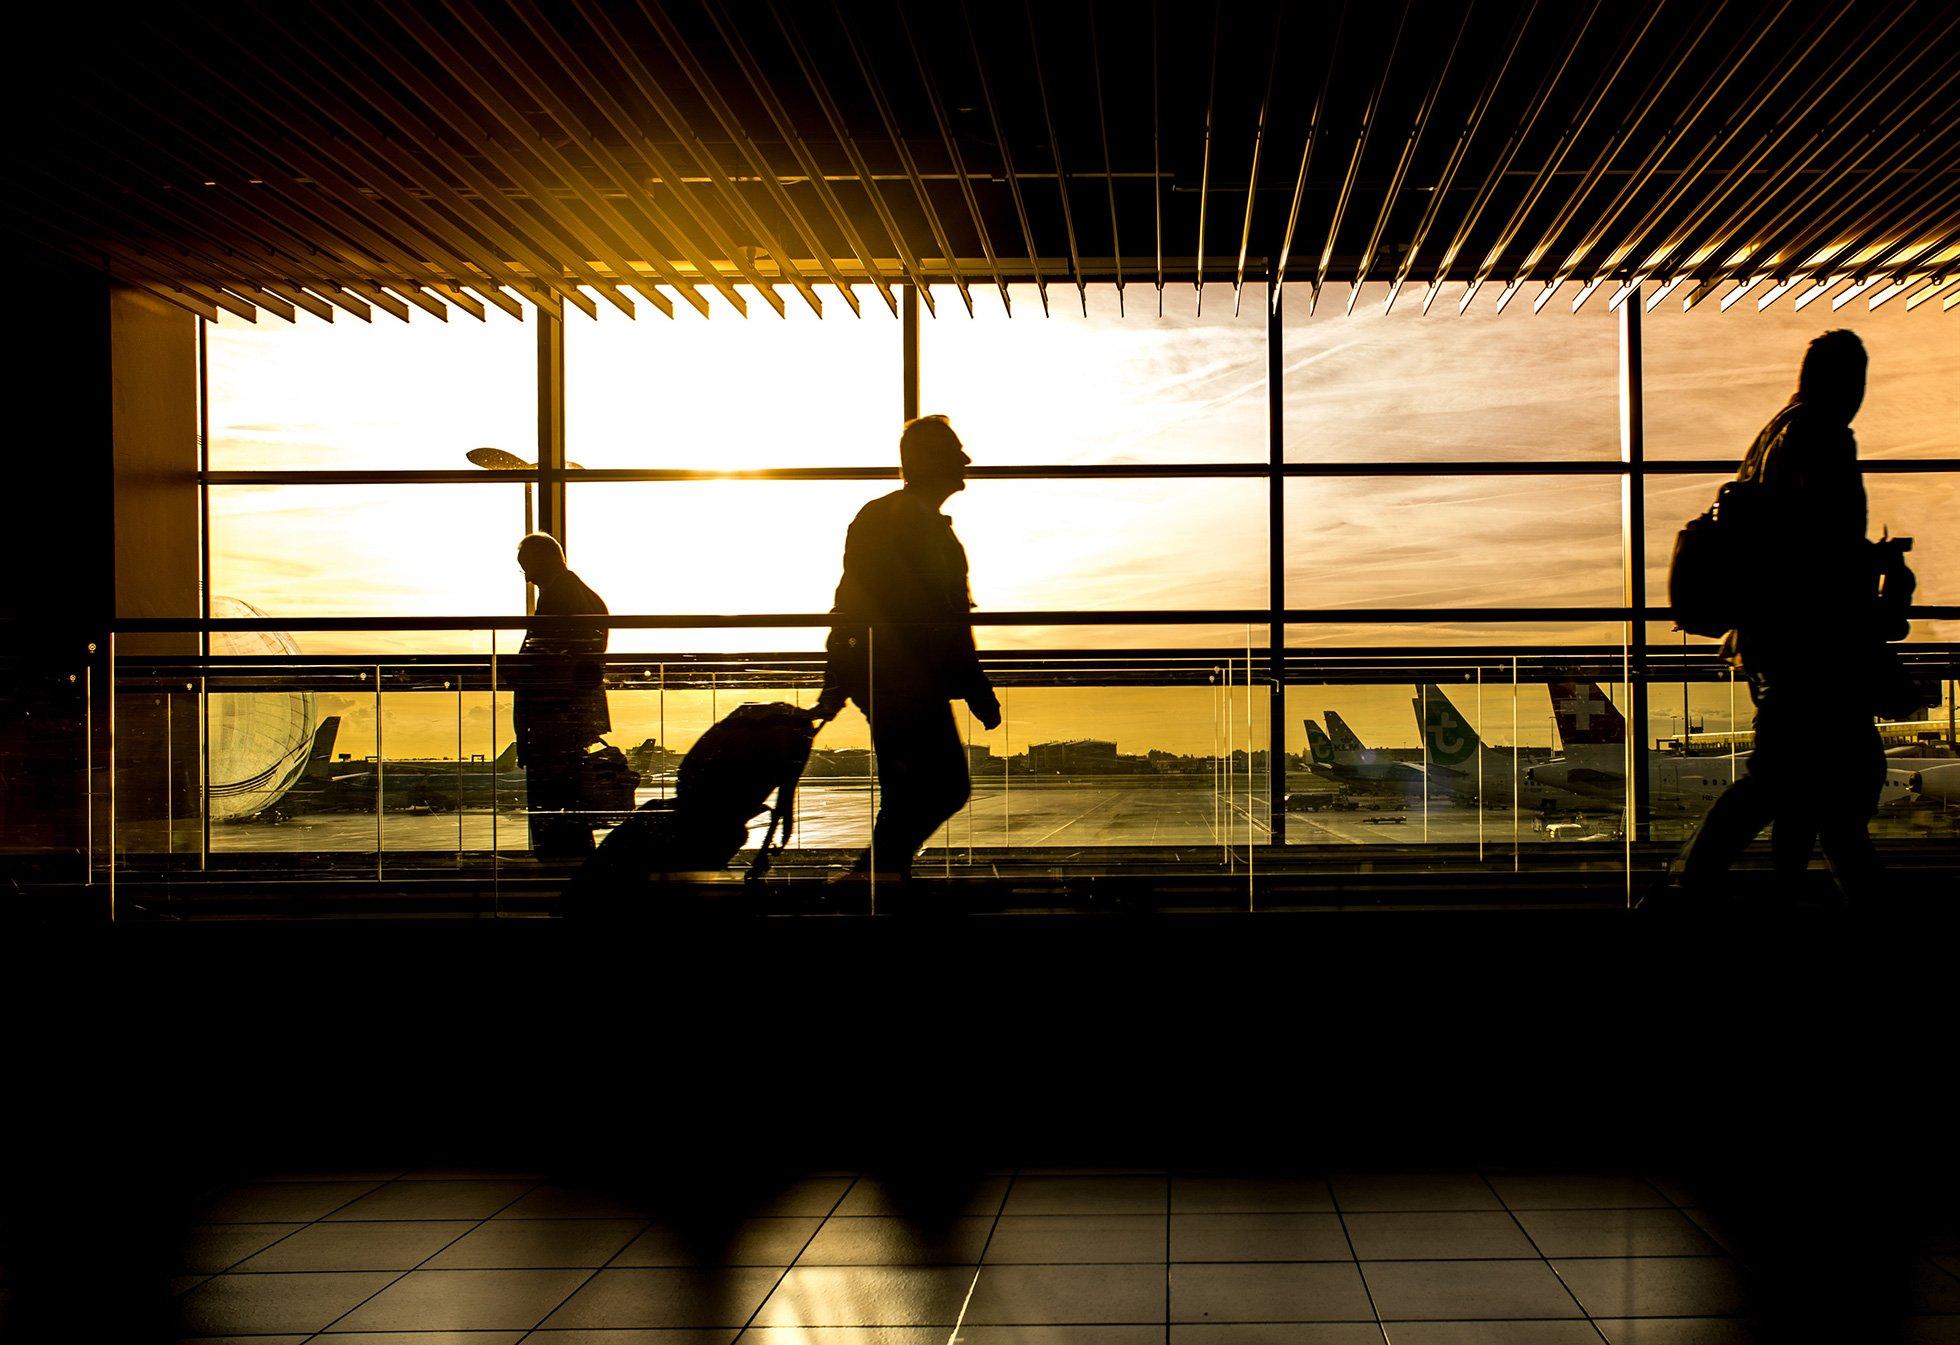 Travel Risk Statistics